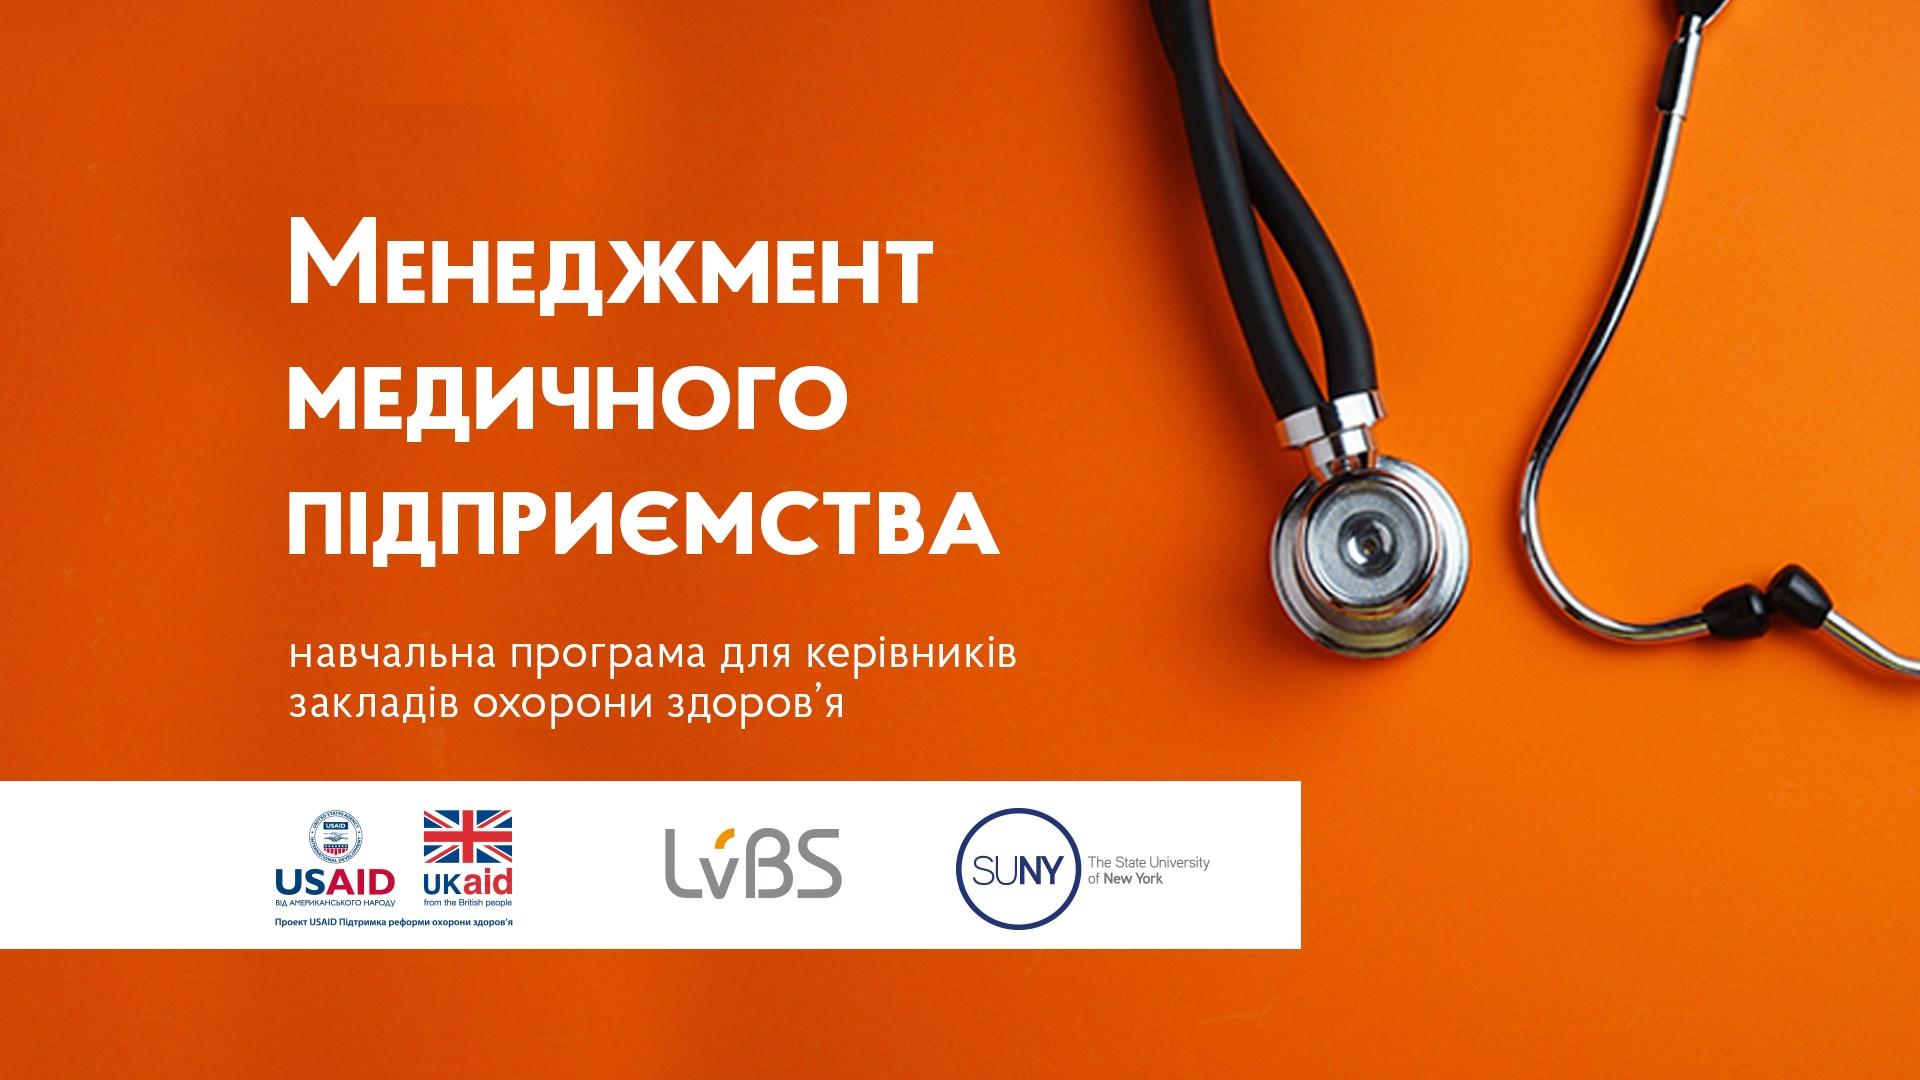 Навчальна програма «Менеджмент медичного підприємства»